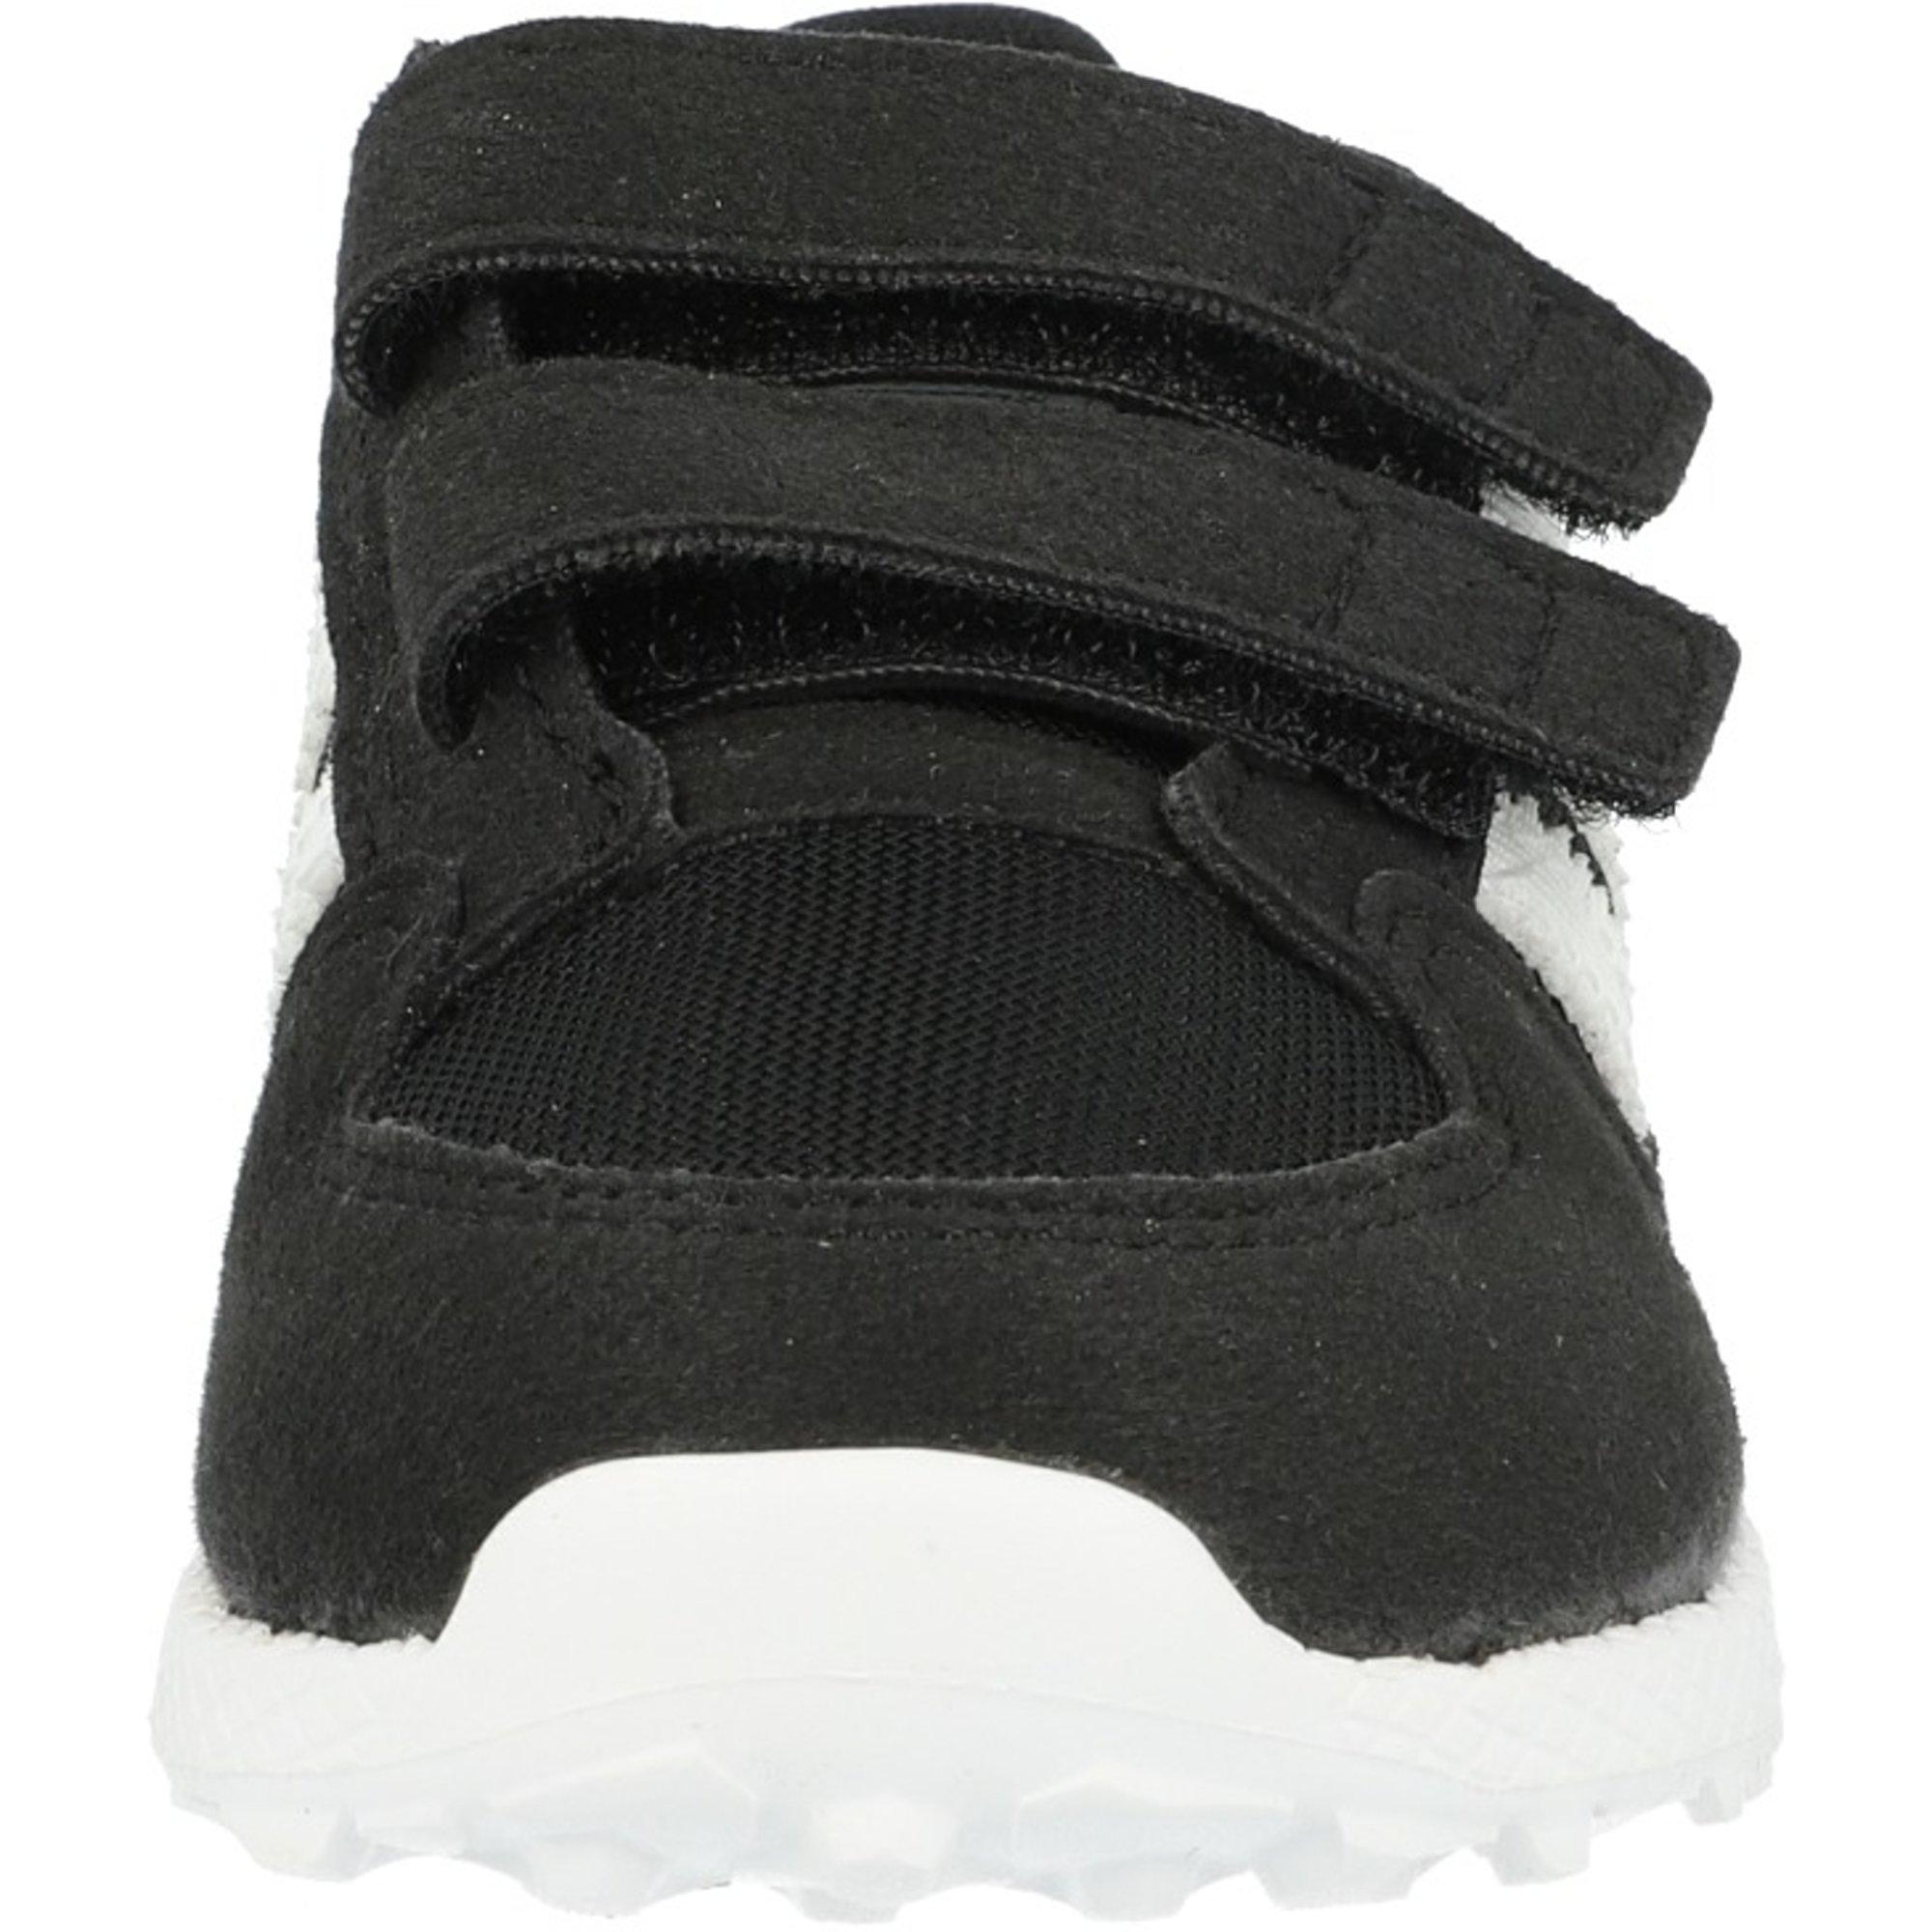 adidas Originals Forest Grove CF I Black Synthetic Suede